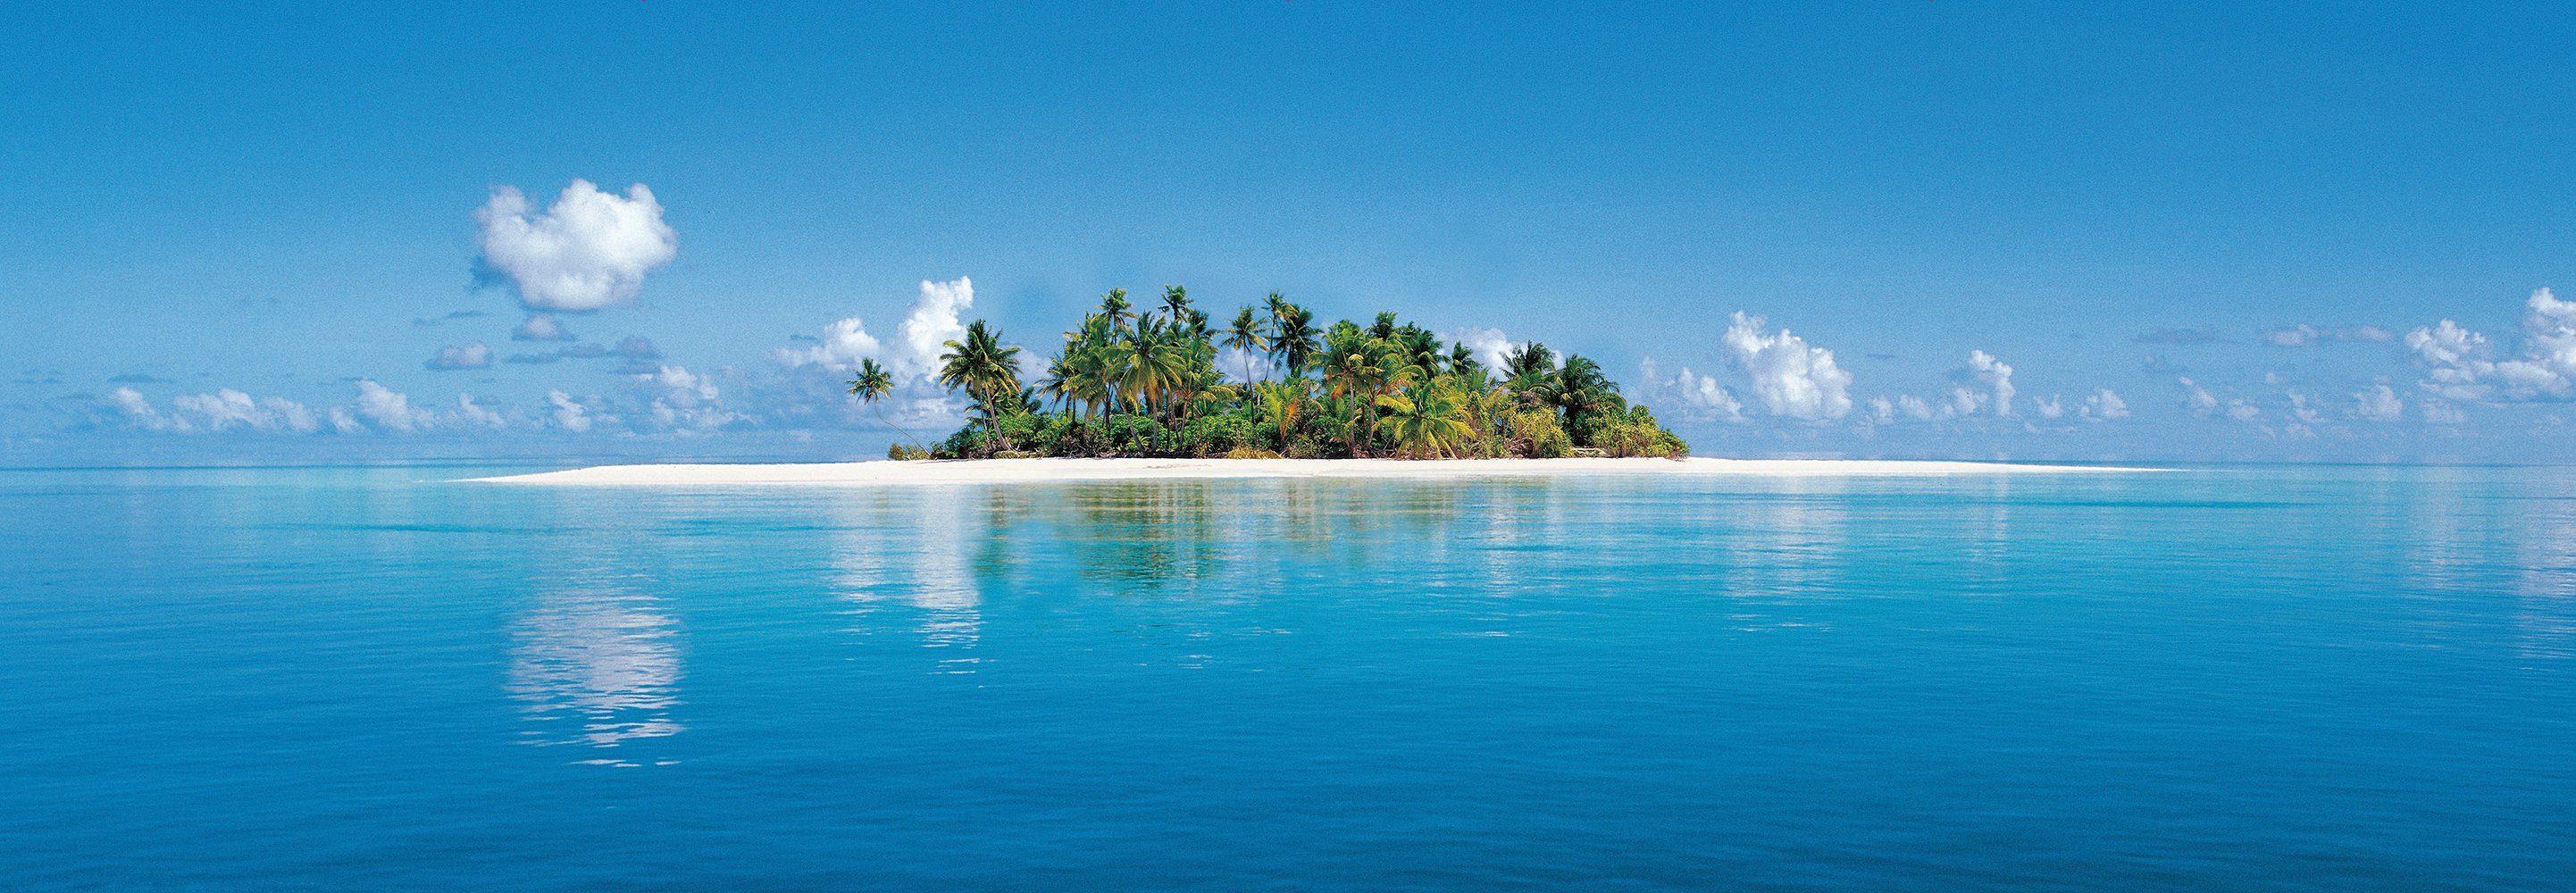 Fototapete »Maldive Island«, 4-teilig, 366x127 cm